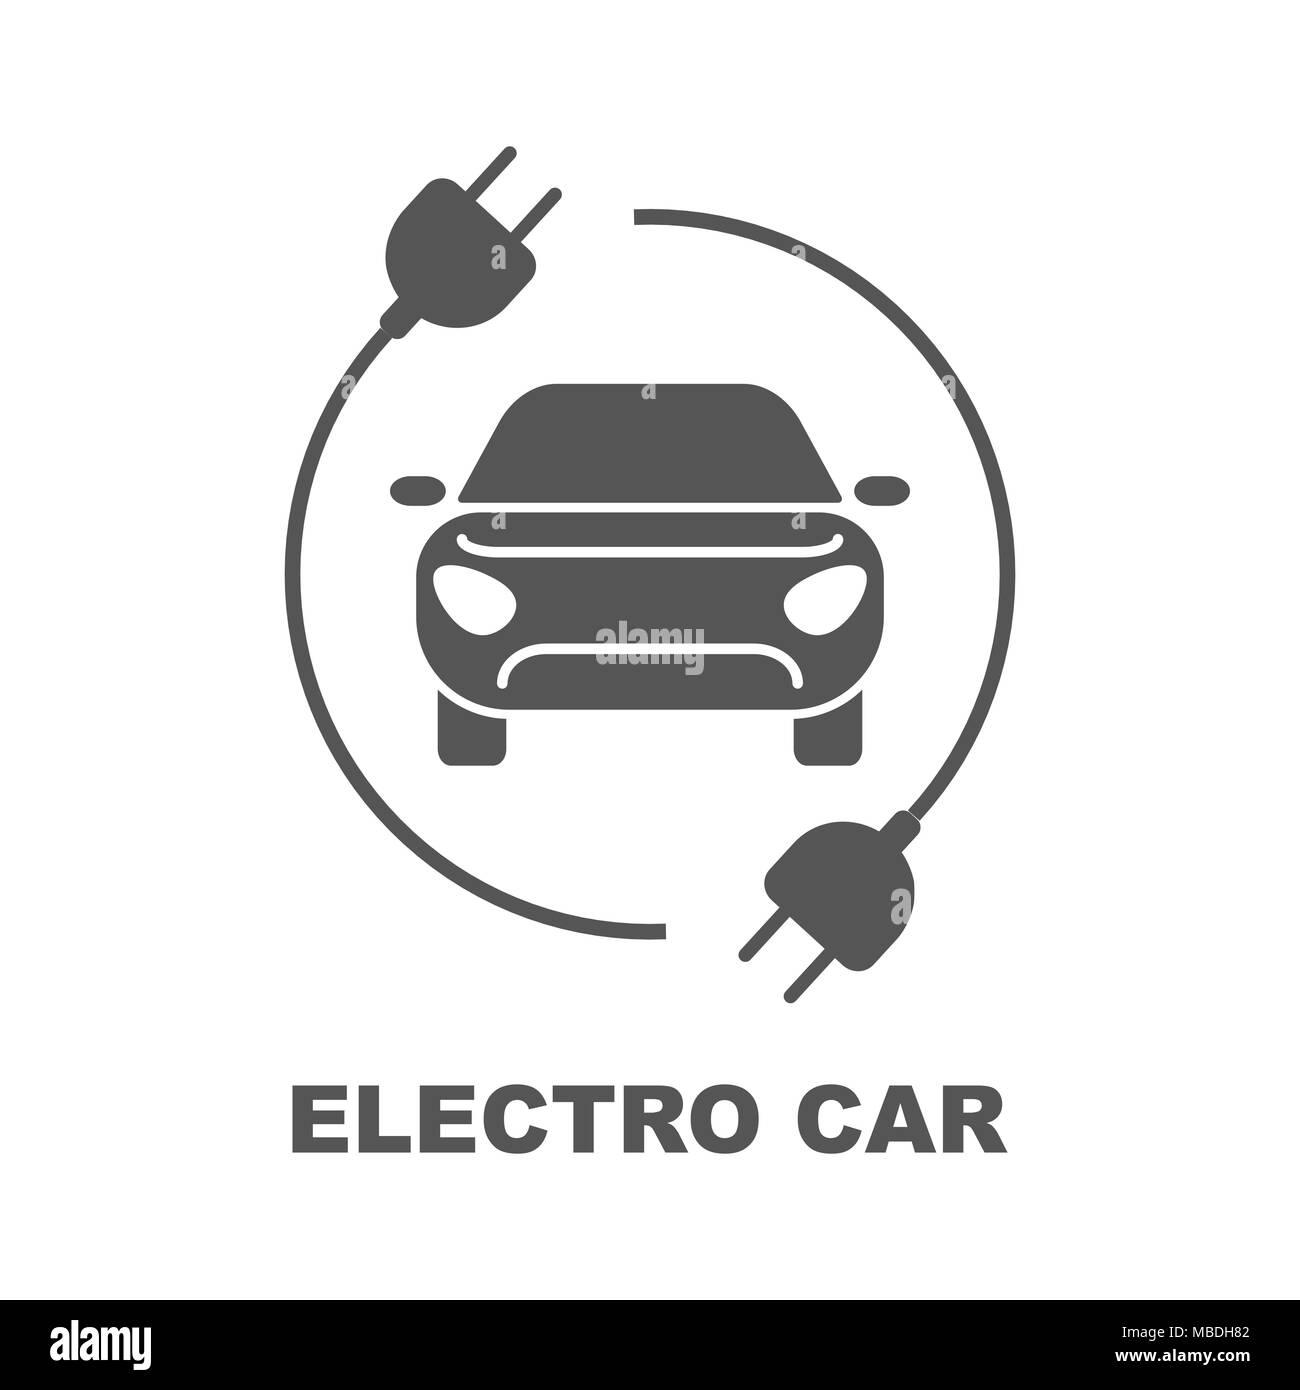 Ziemlich Erdsymbol Elektrisch Ideen - Schaltplan Serie Circuit ...